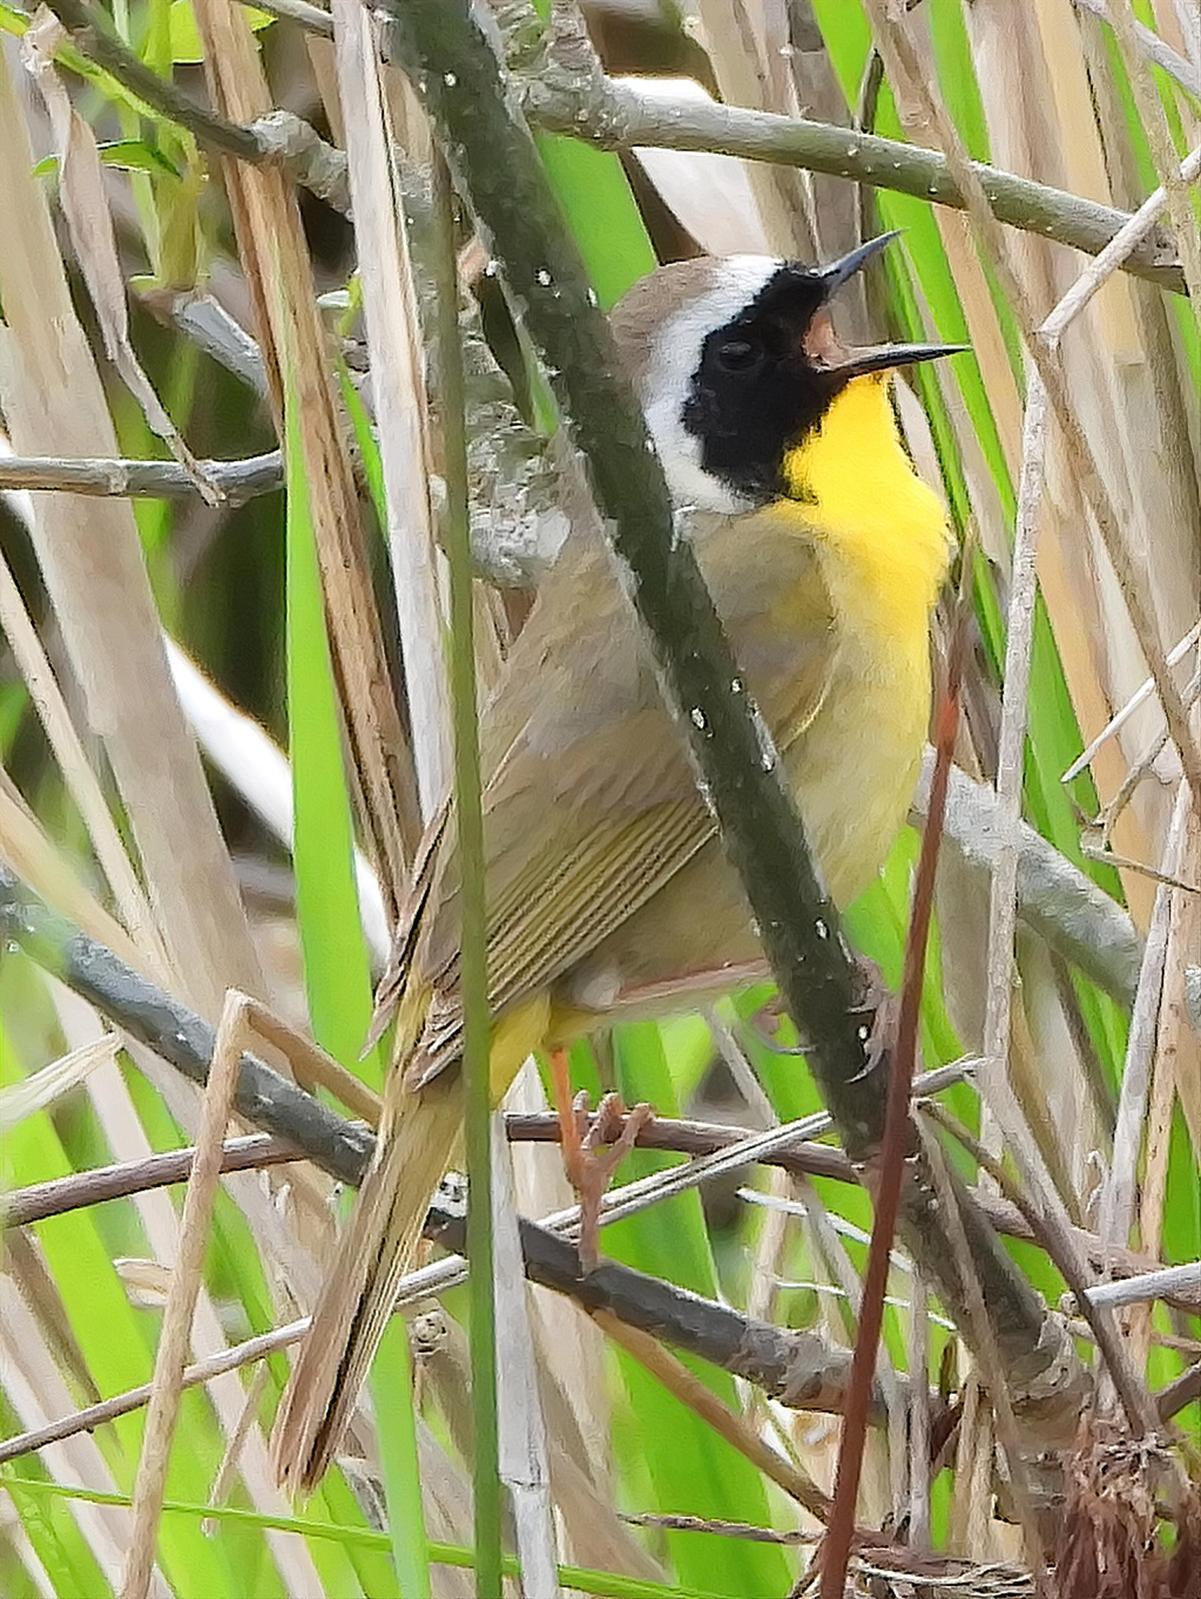 Common Yellowthroat Photo by Dan Tallman